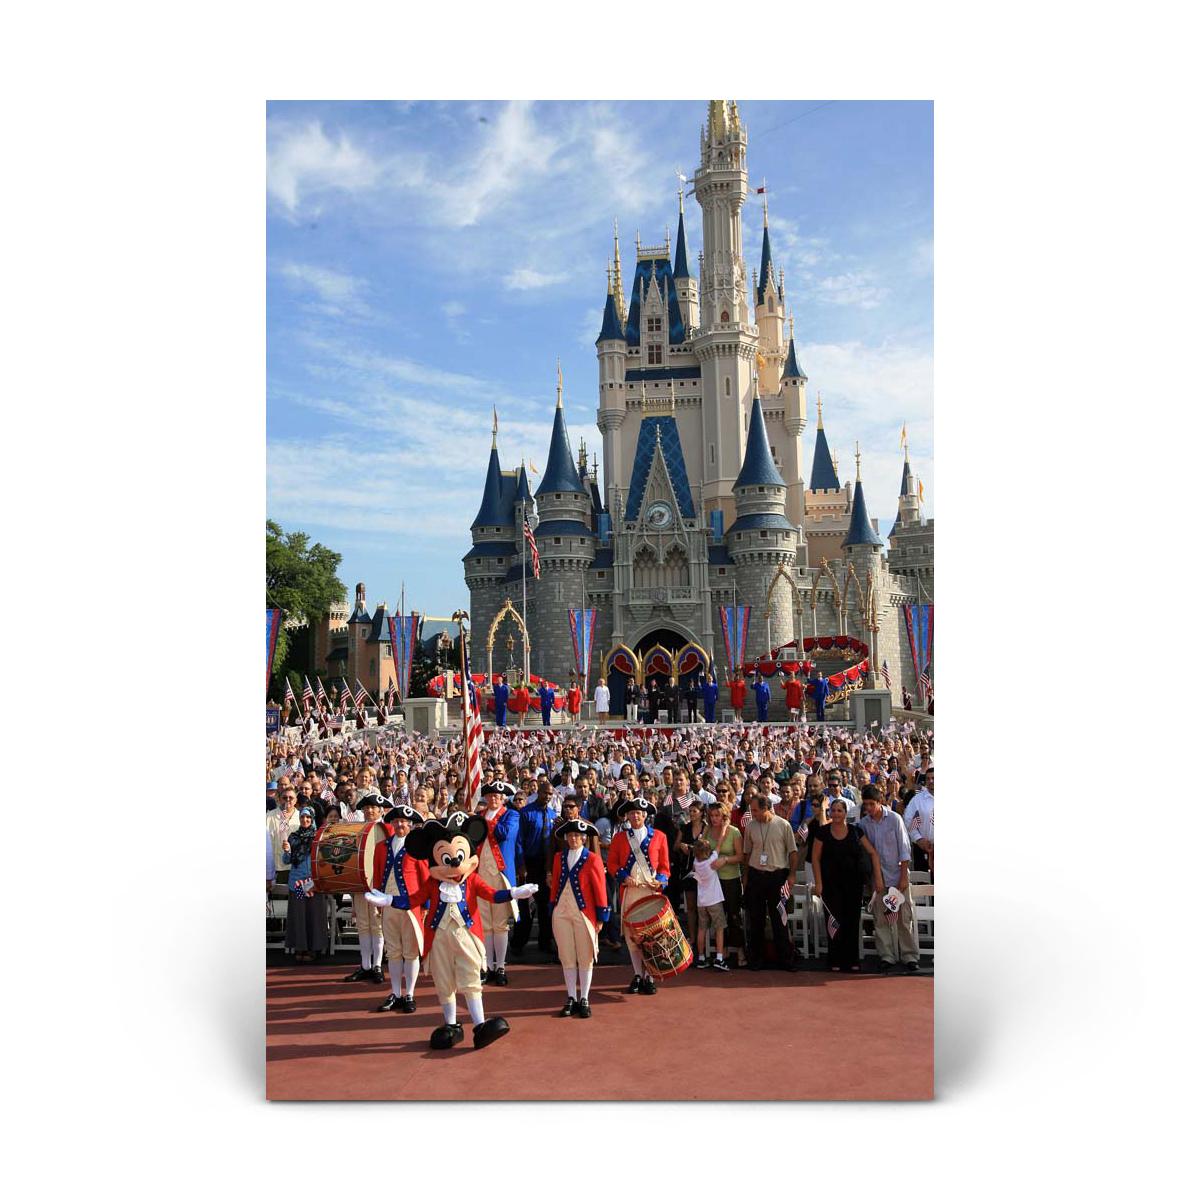 Cinderella's Castle: Colonial Welcome